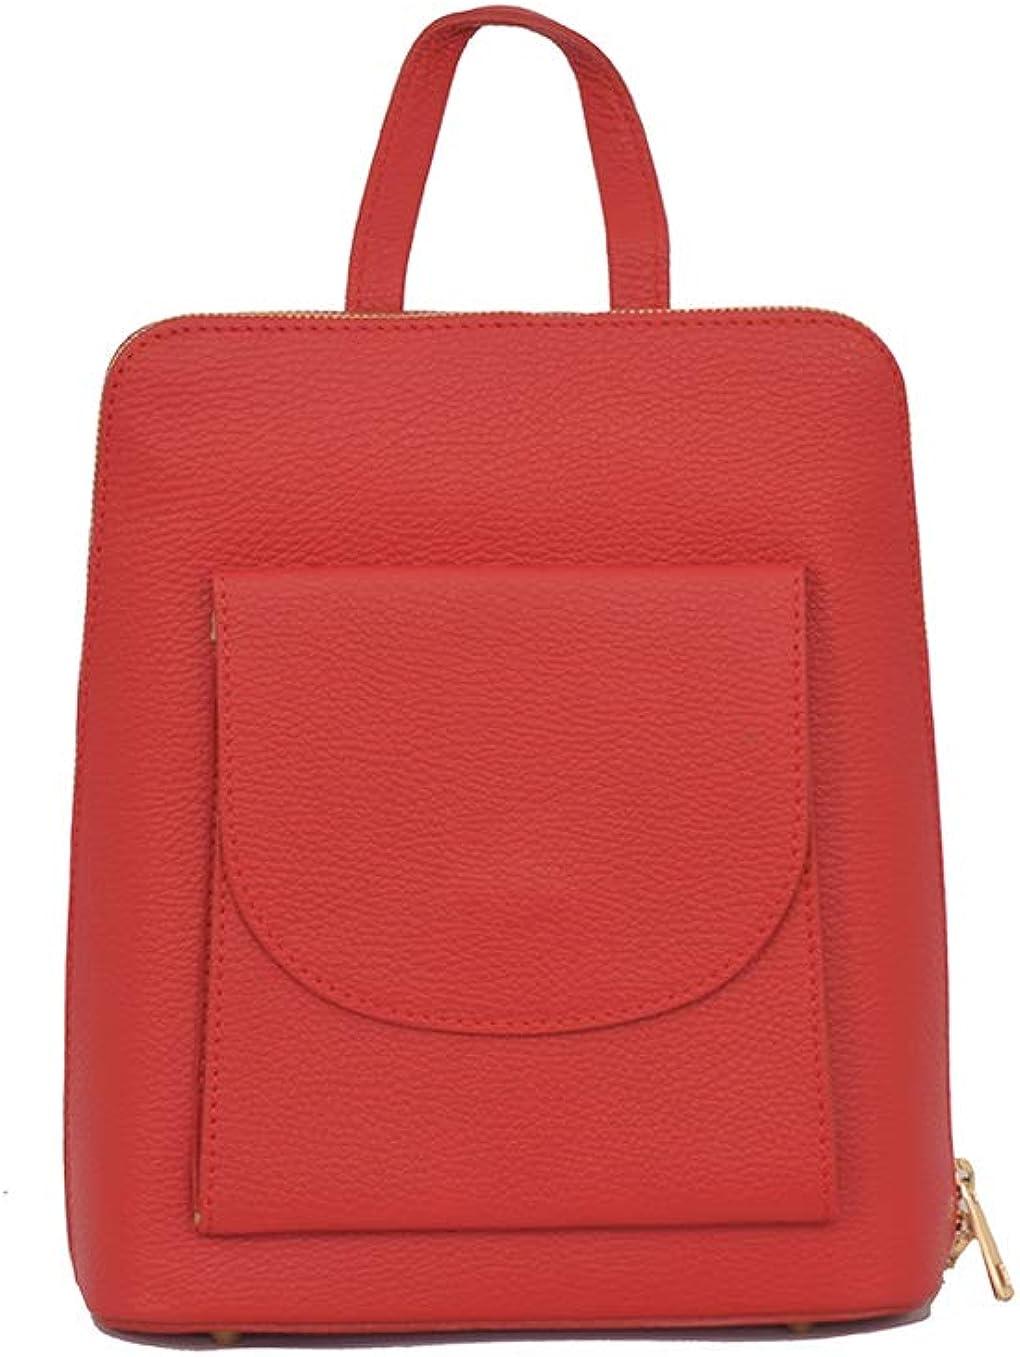 A to Z Leather Mochila 3 en 1 Backpack/Mochila bandolera o mochila cruzada. Auténtico cuero italiano. Rojo